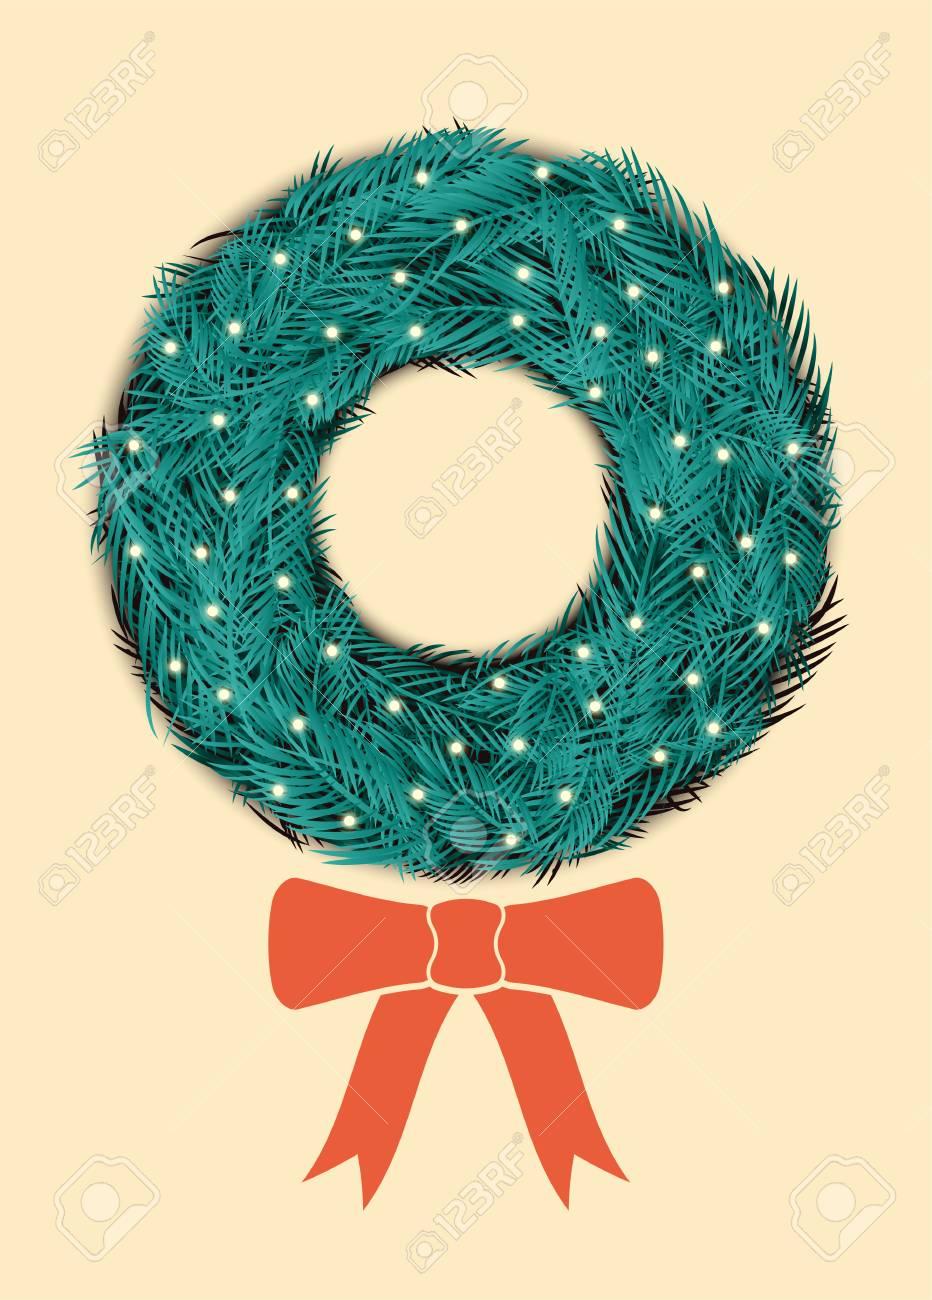 Christmas Greeting Card Design With Christmas Wreath. Retro Vector ...